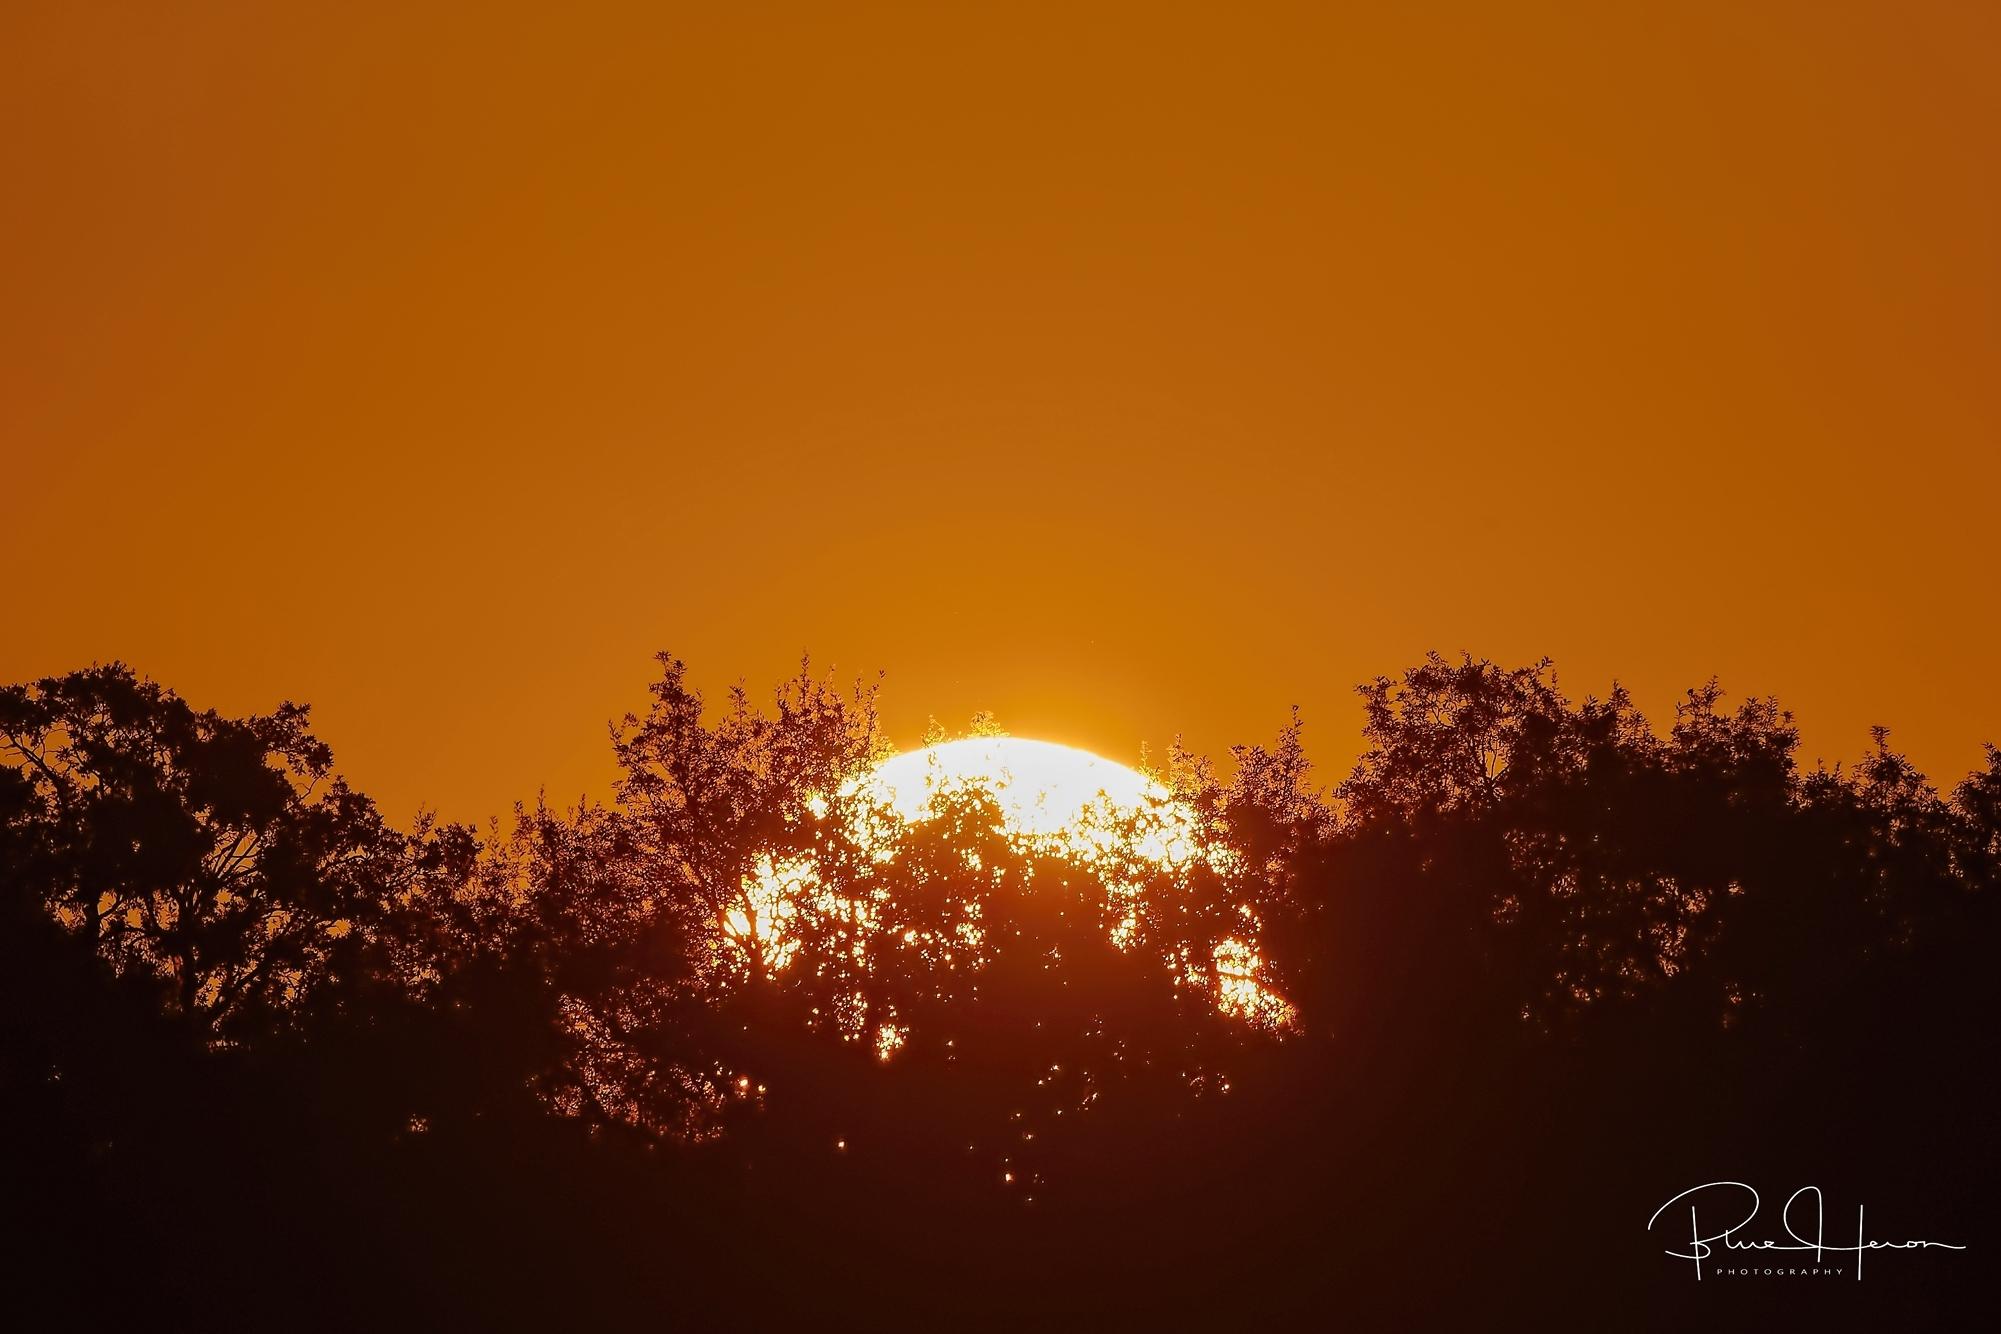 Morning sun-fire on the horizon..